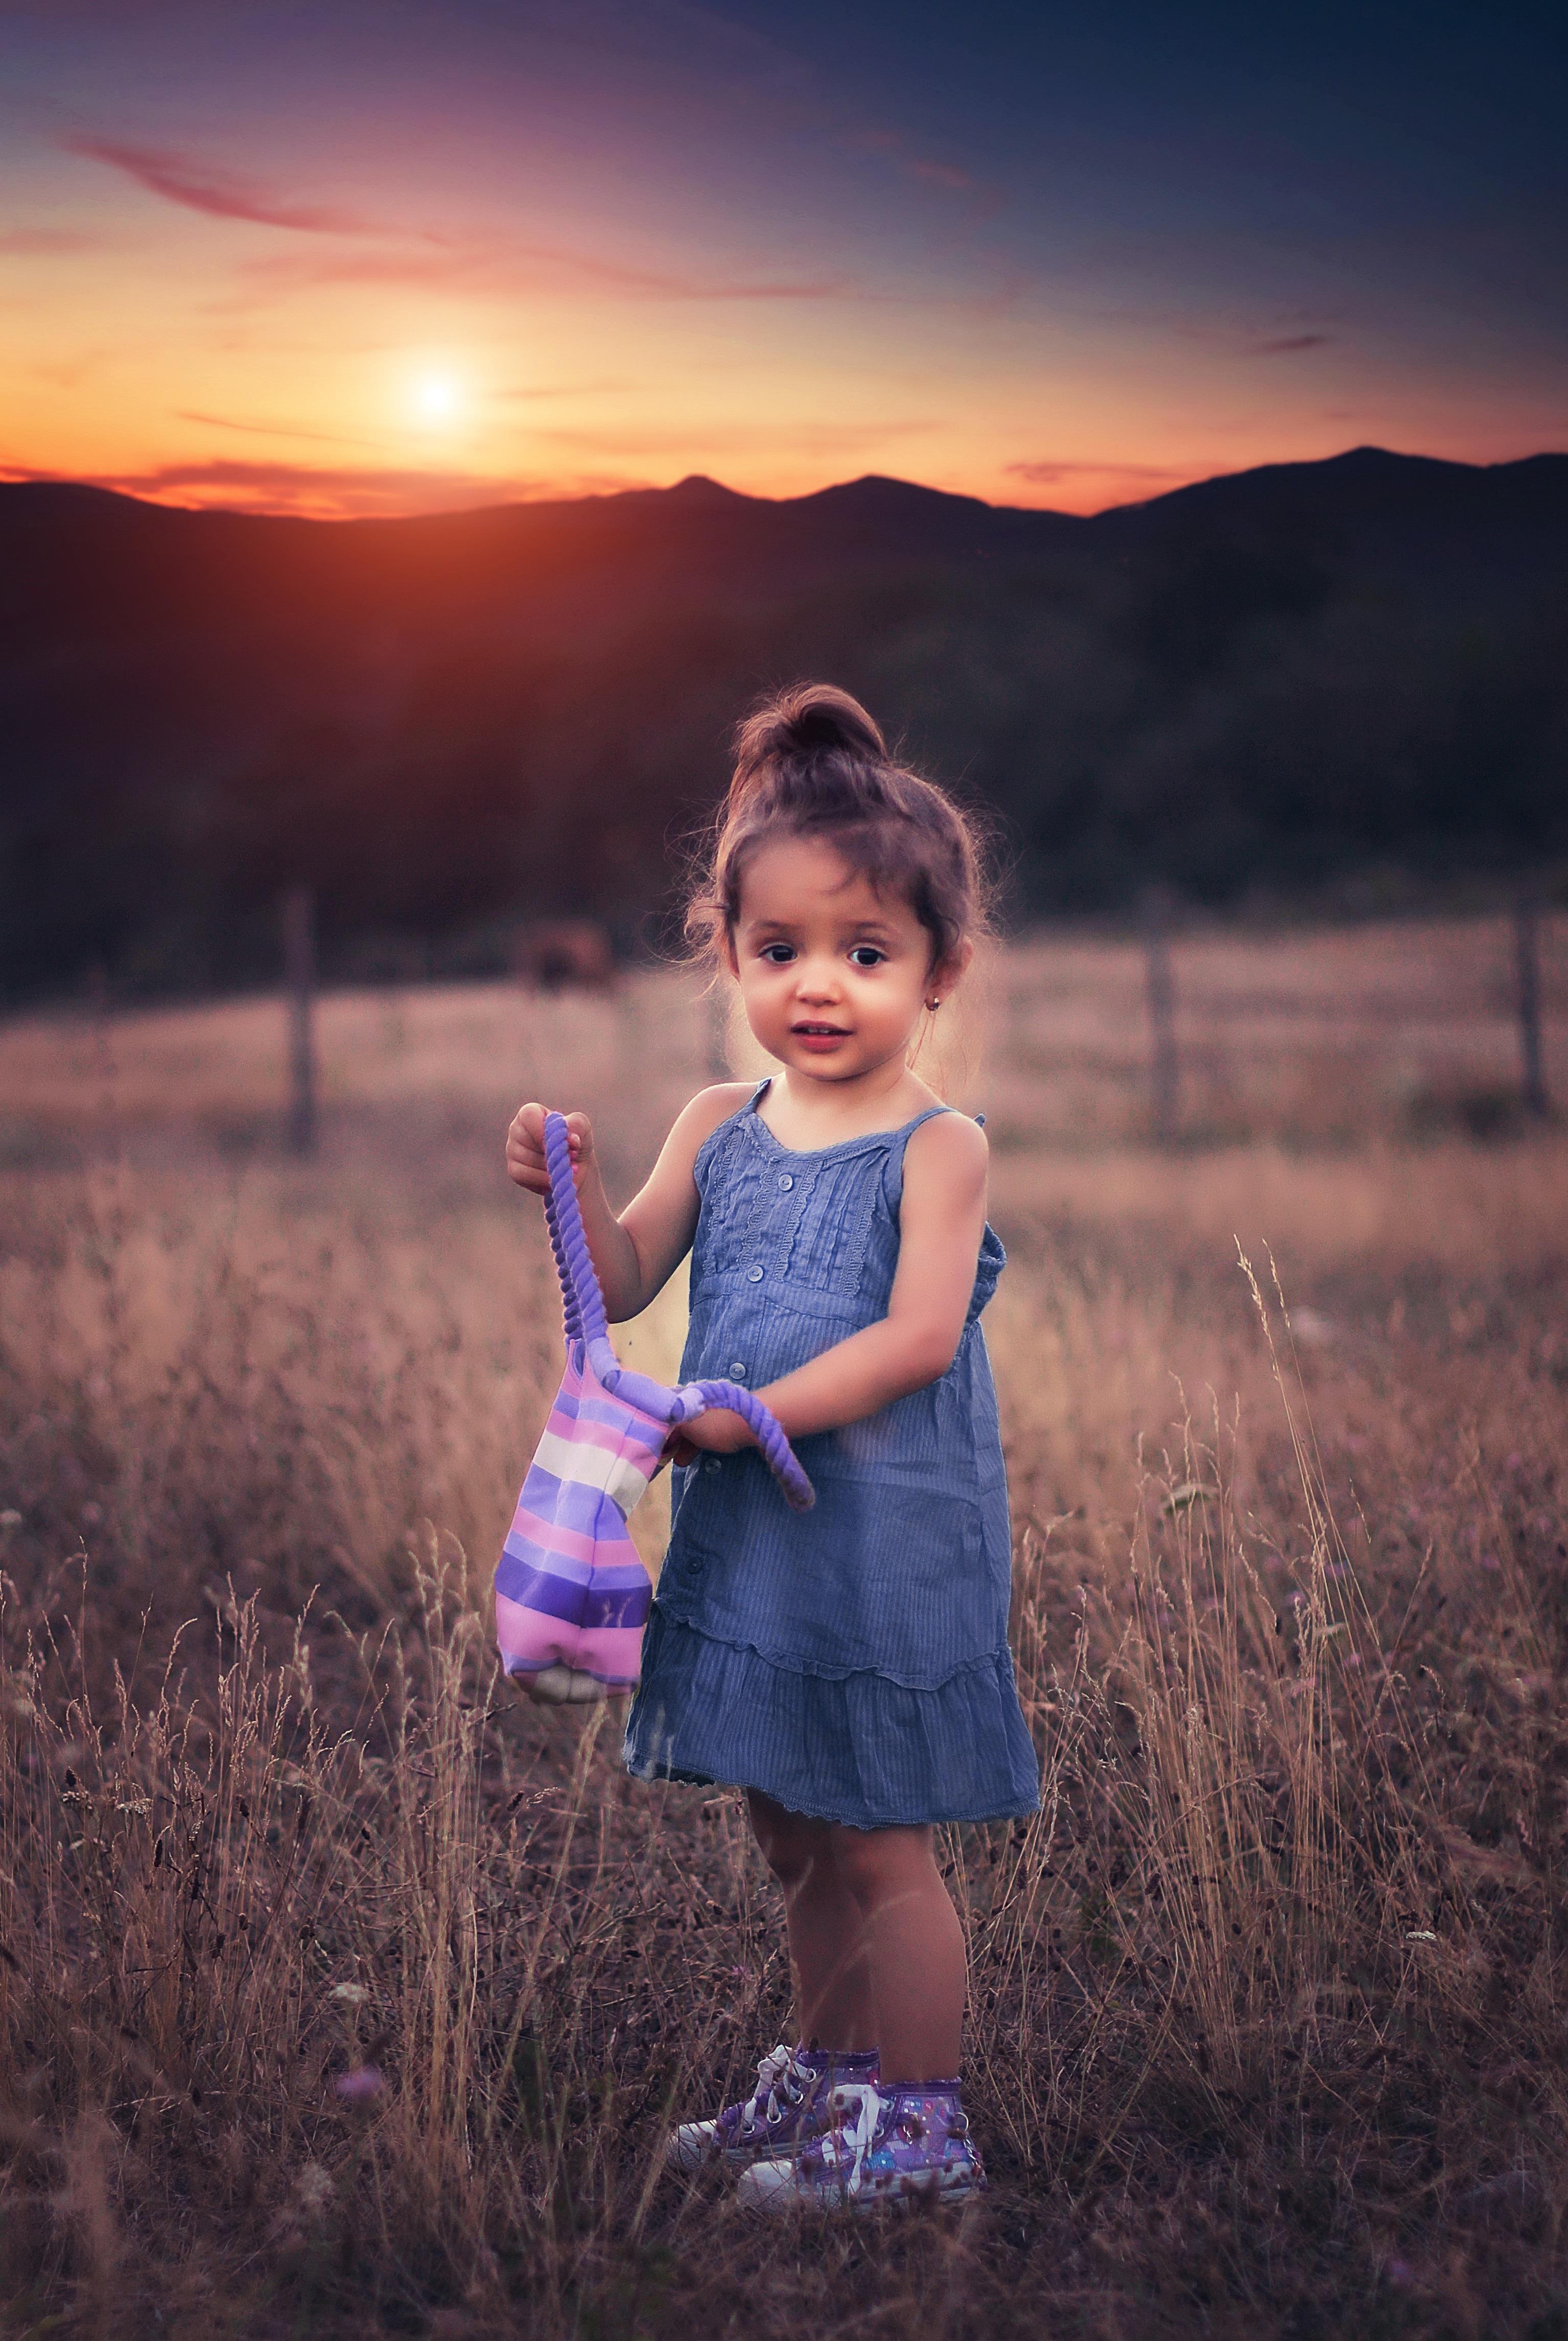 Cute Baby Girl Swing Hd Wallpaper Girl In Blue Dress Standing On Grass Field During Sunset